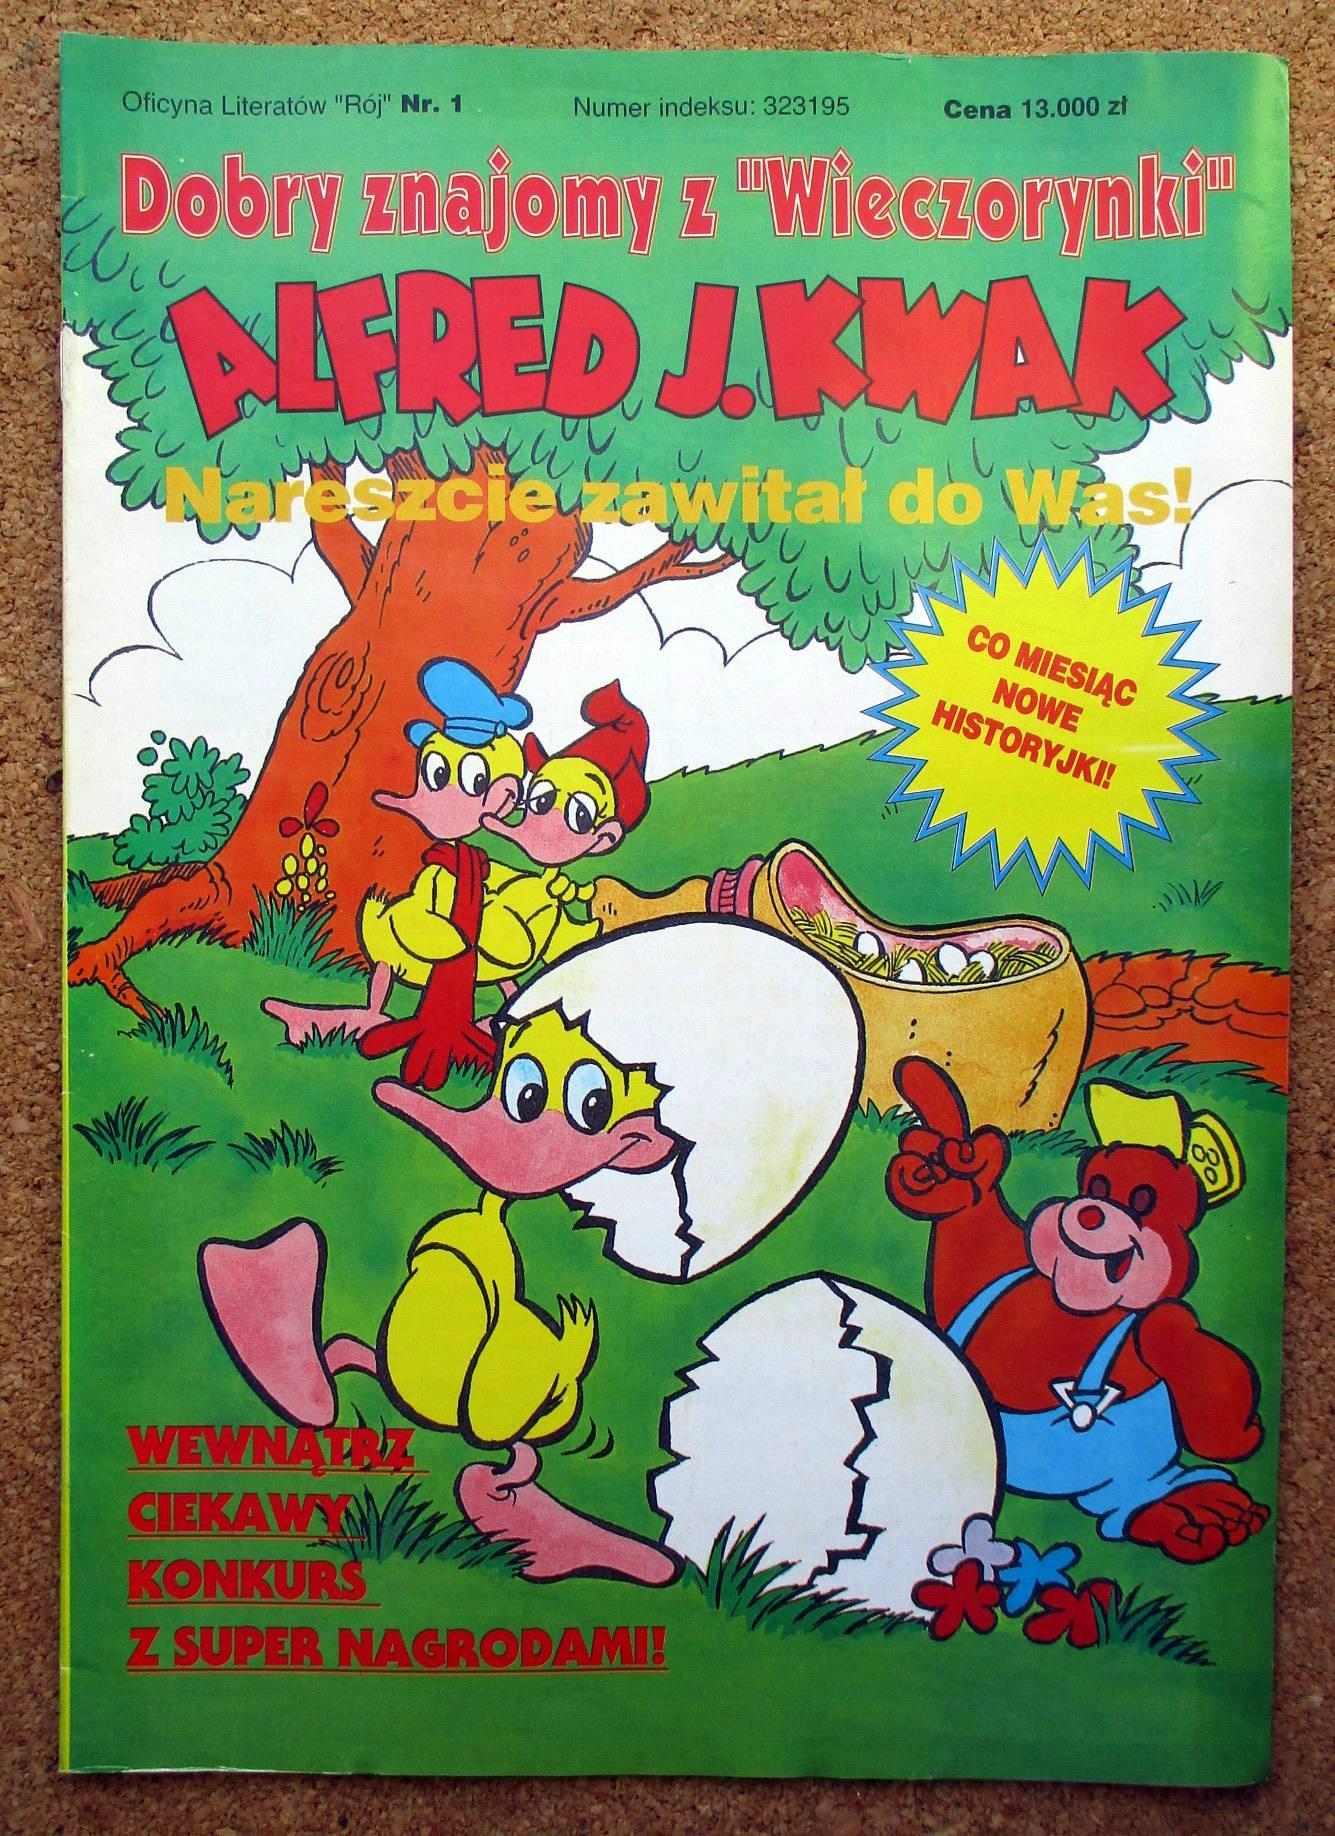 ALFRED J. KWAK 1 STAN BDB A4 KOMIKS J.KWAK UNIKAT